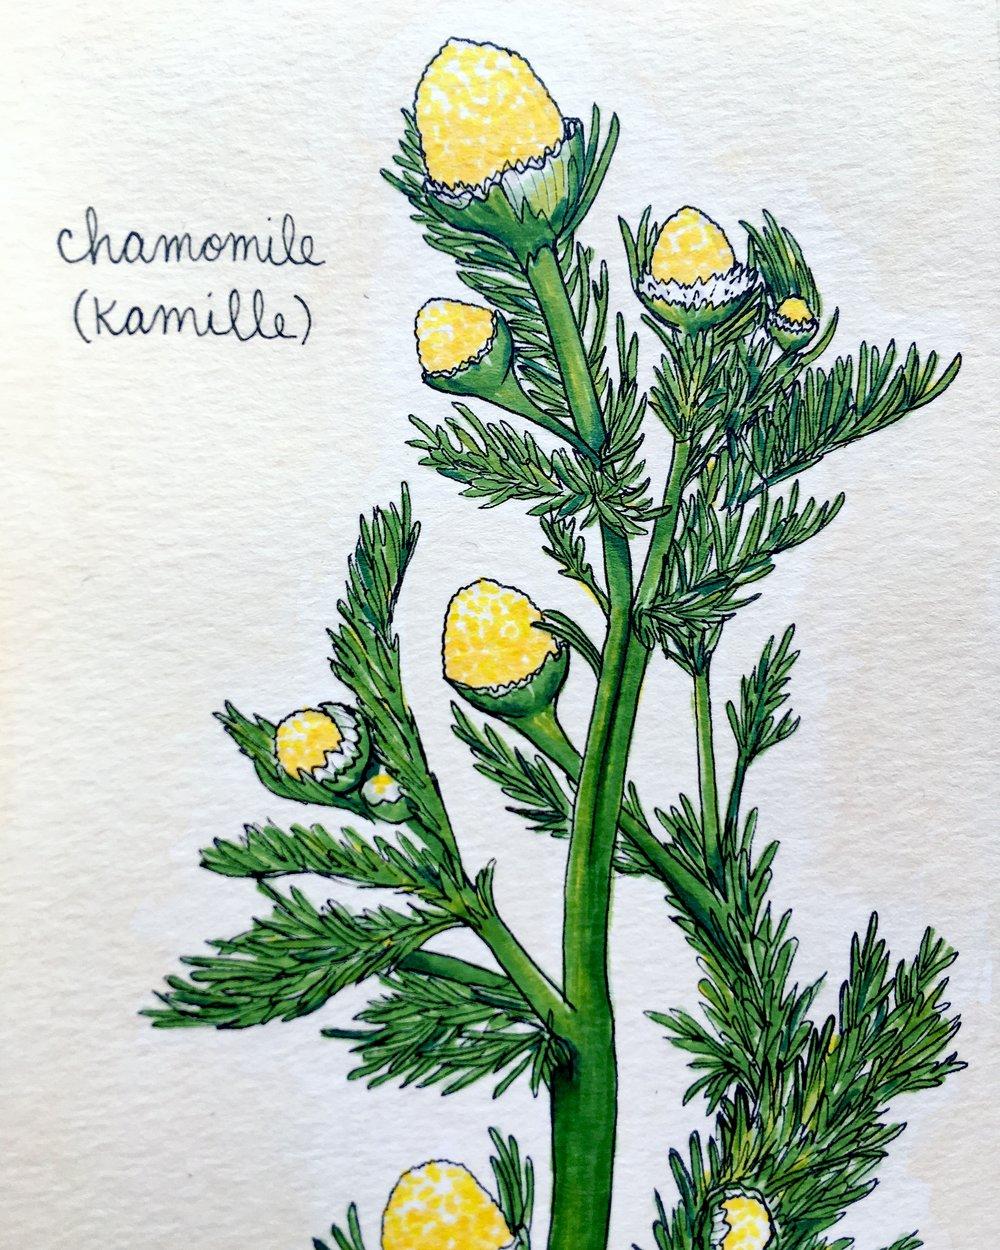 66_Chamomile.JPG